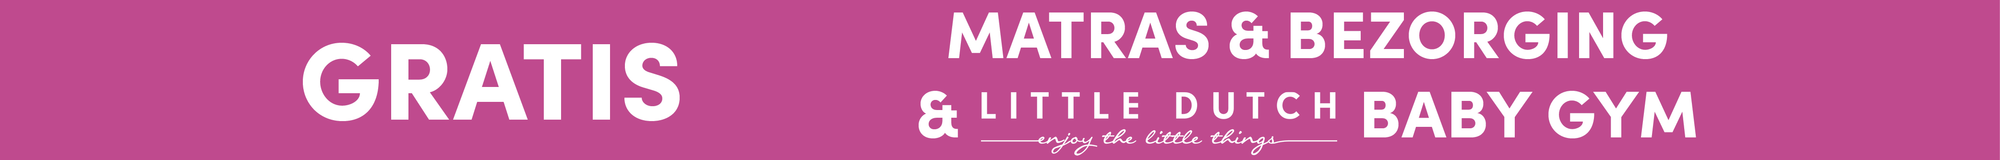 Gratis Matras & Bezorging